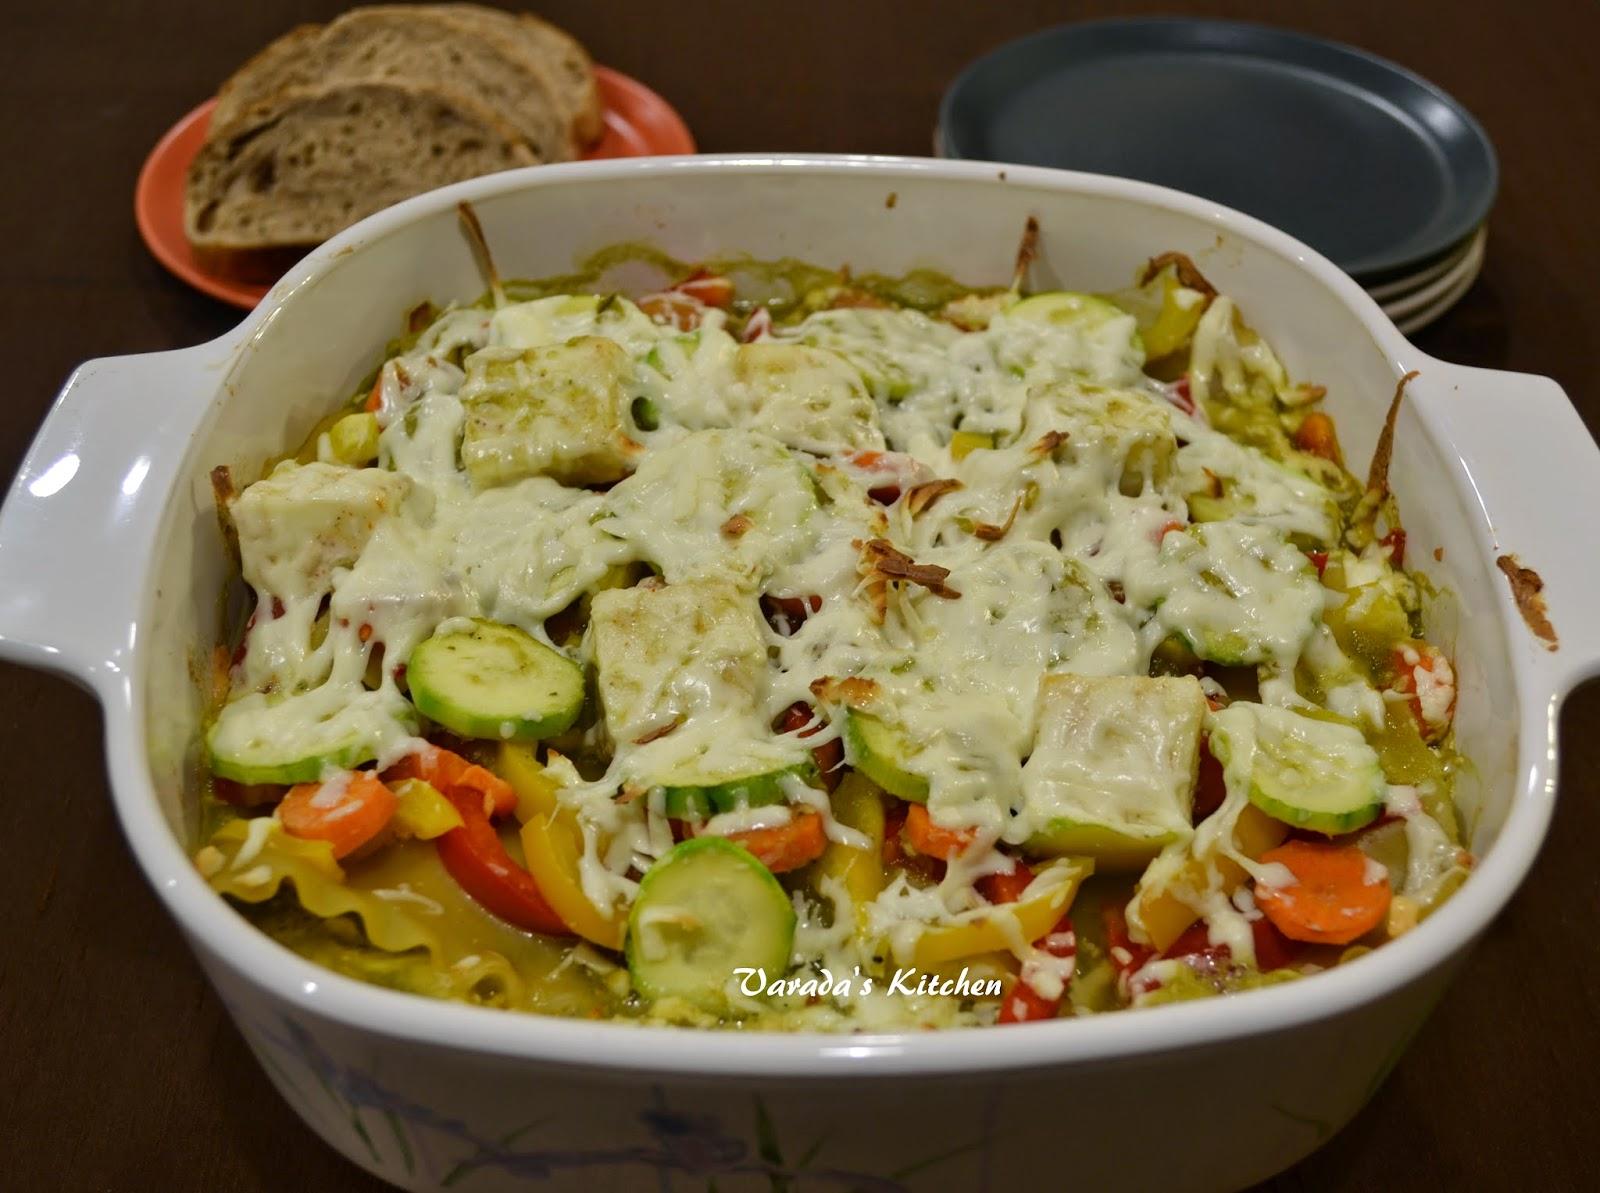 Varada's Kitchen: Salsa Verde Vegetable Lasagna / Pasta Bake